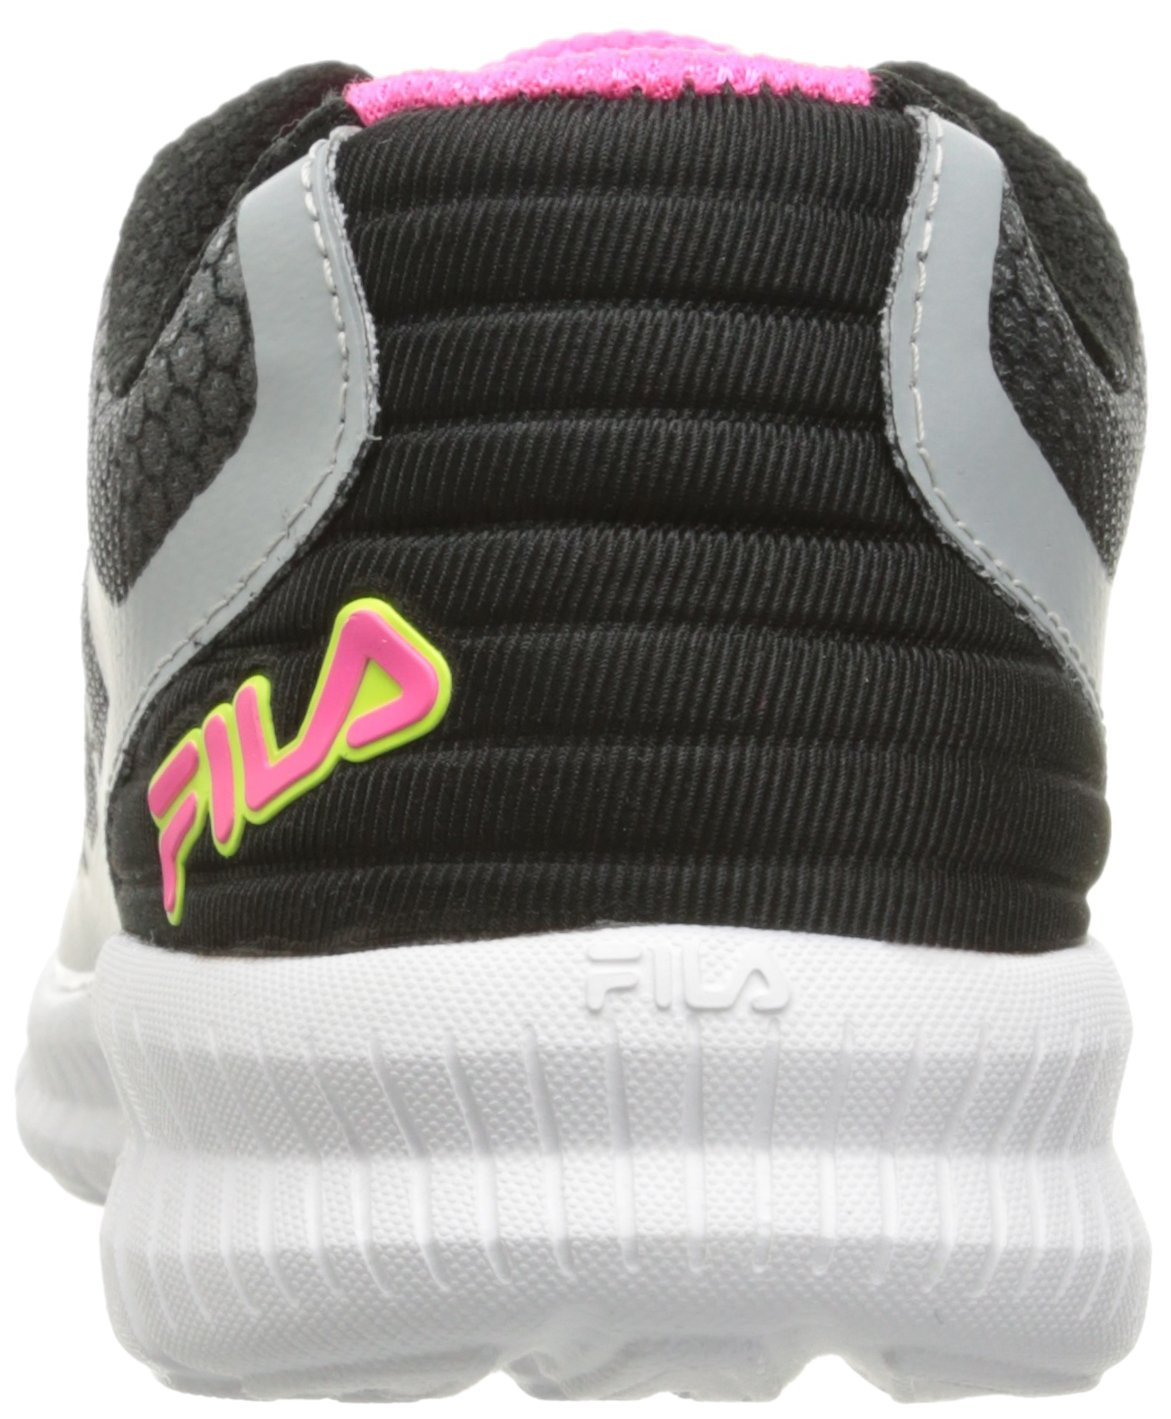 buy popular e5dde e0264 Fila Mujer s Highrise Memory s Speedstride corriendo zapato Shoe Highrise s  corriendo b10924